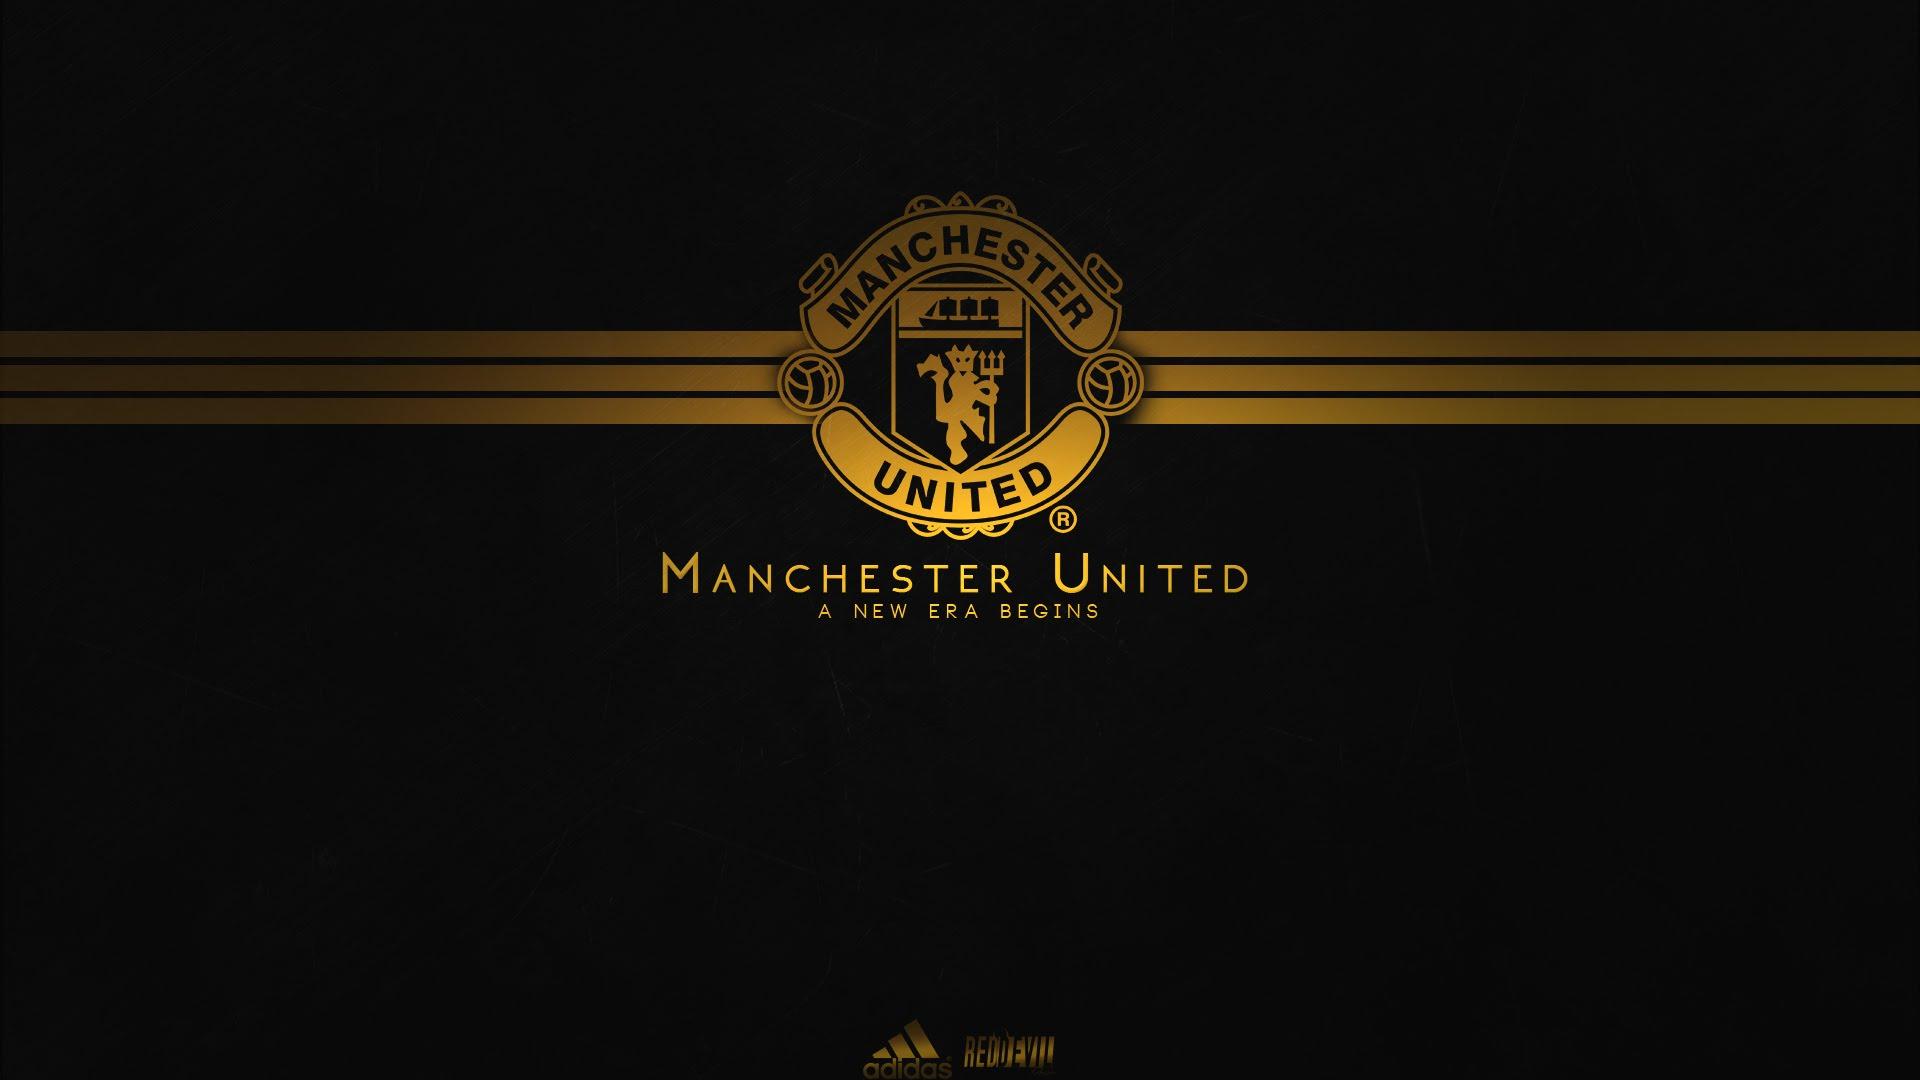 manchester united wallpaper 1920x1080